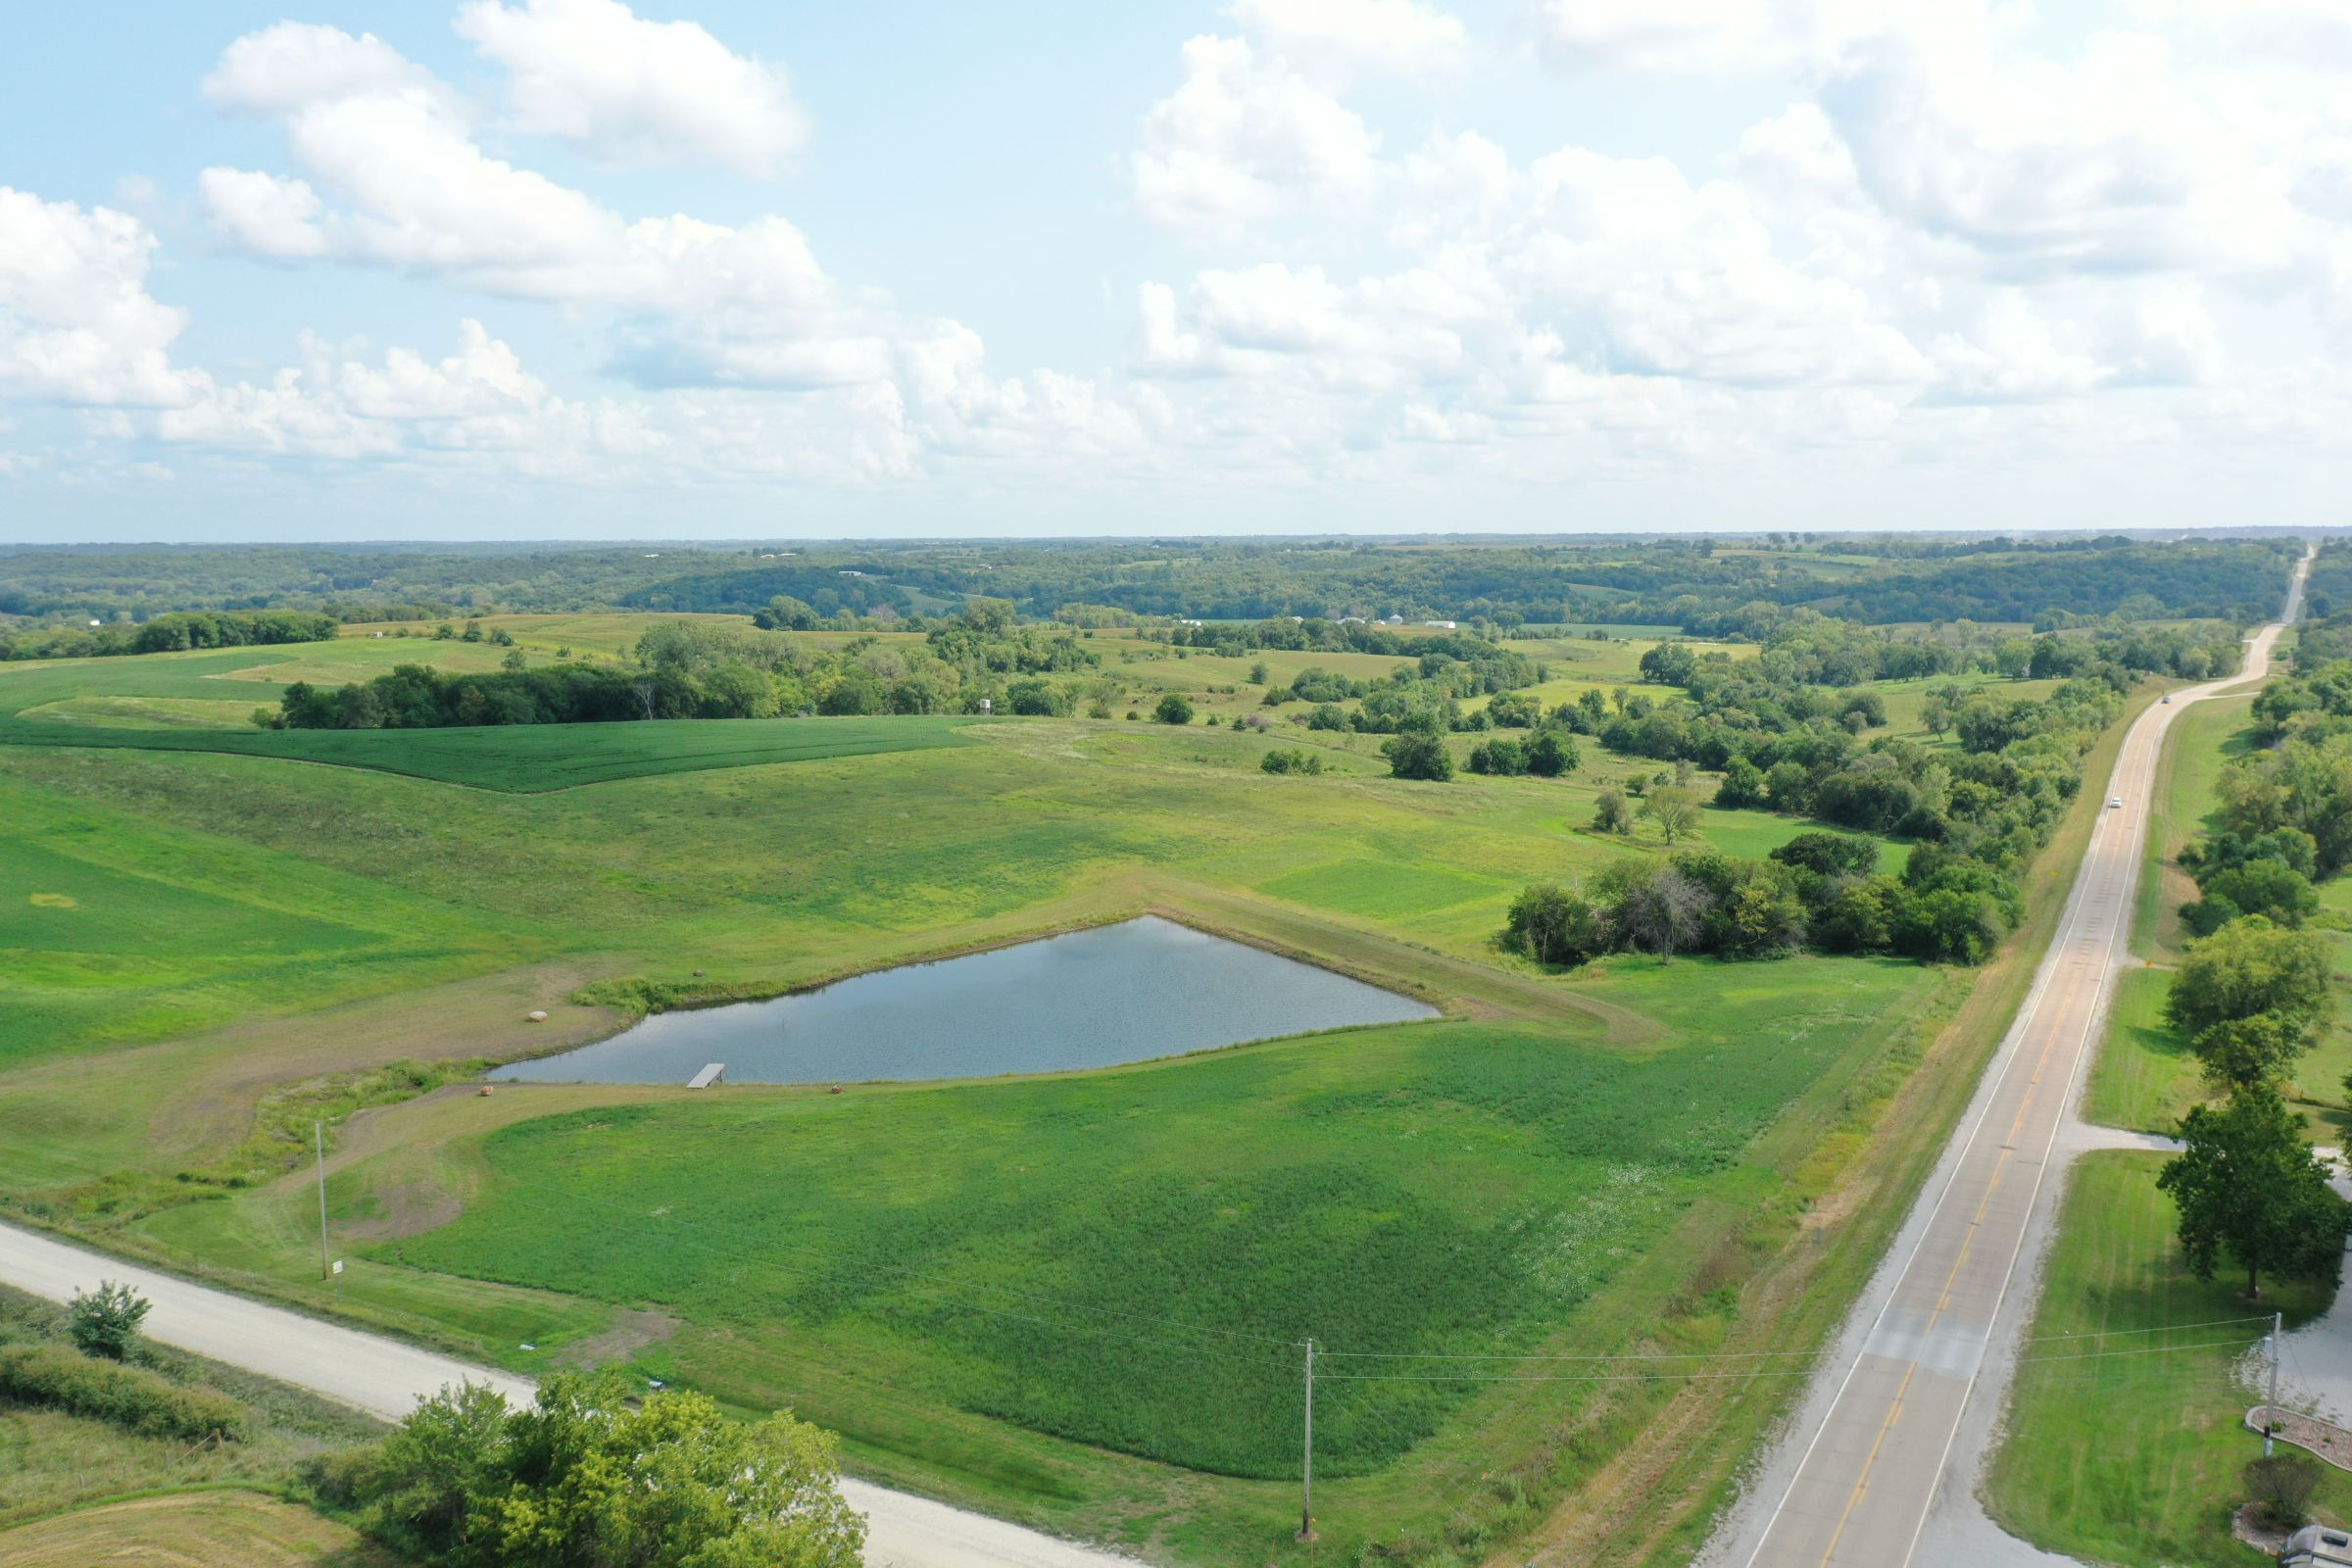 land-warren-county-iowa-8-acres-listing-number-15696-1-2021-08-24-222433.JPG